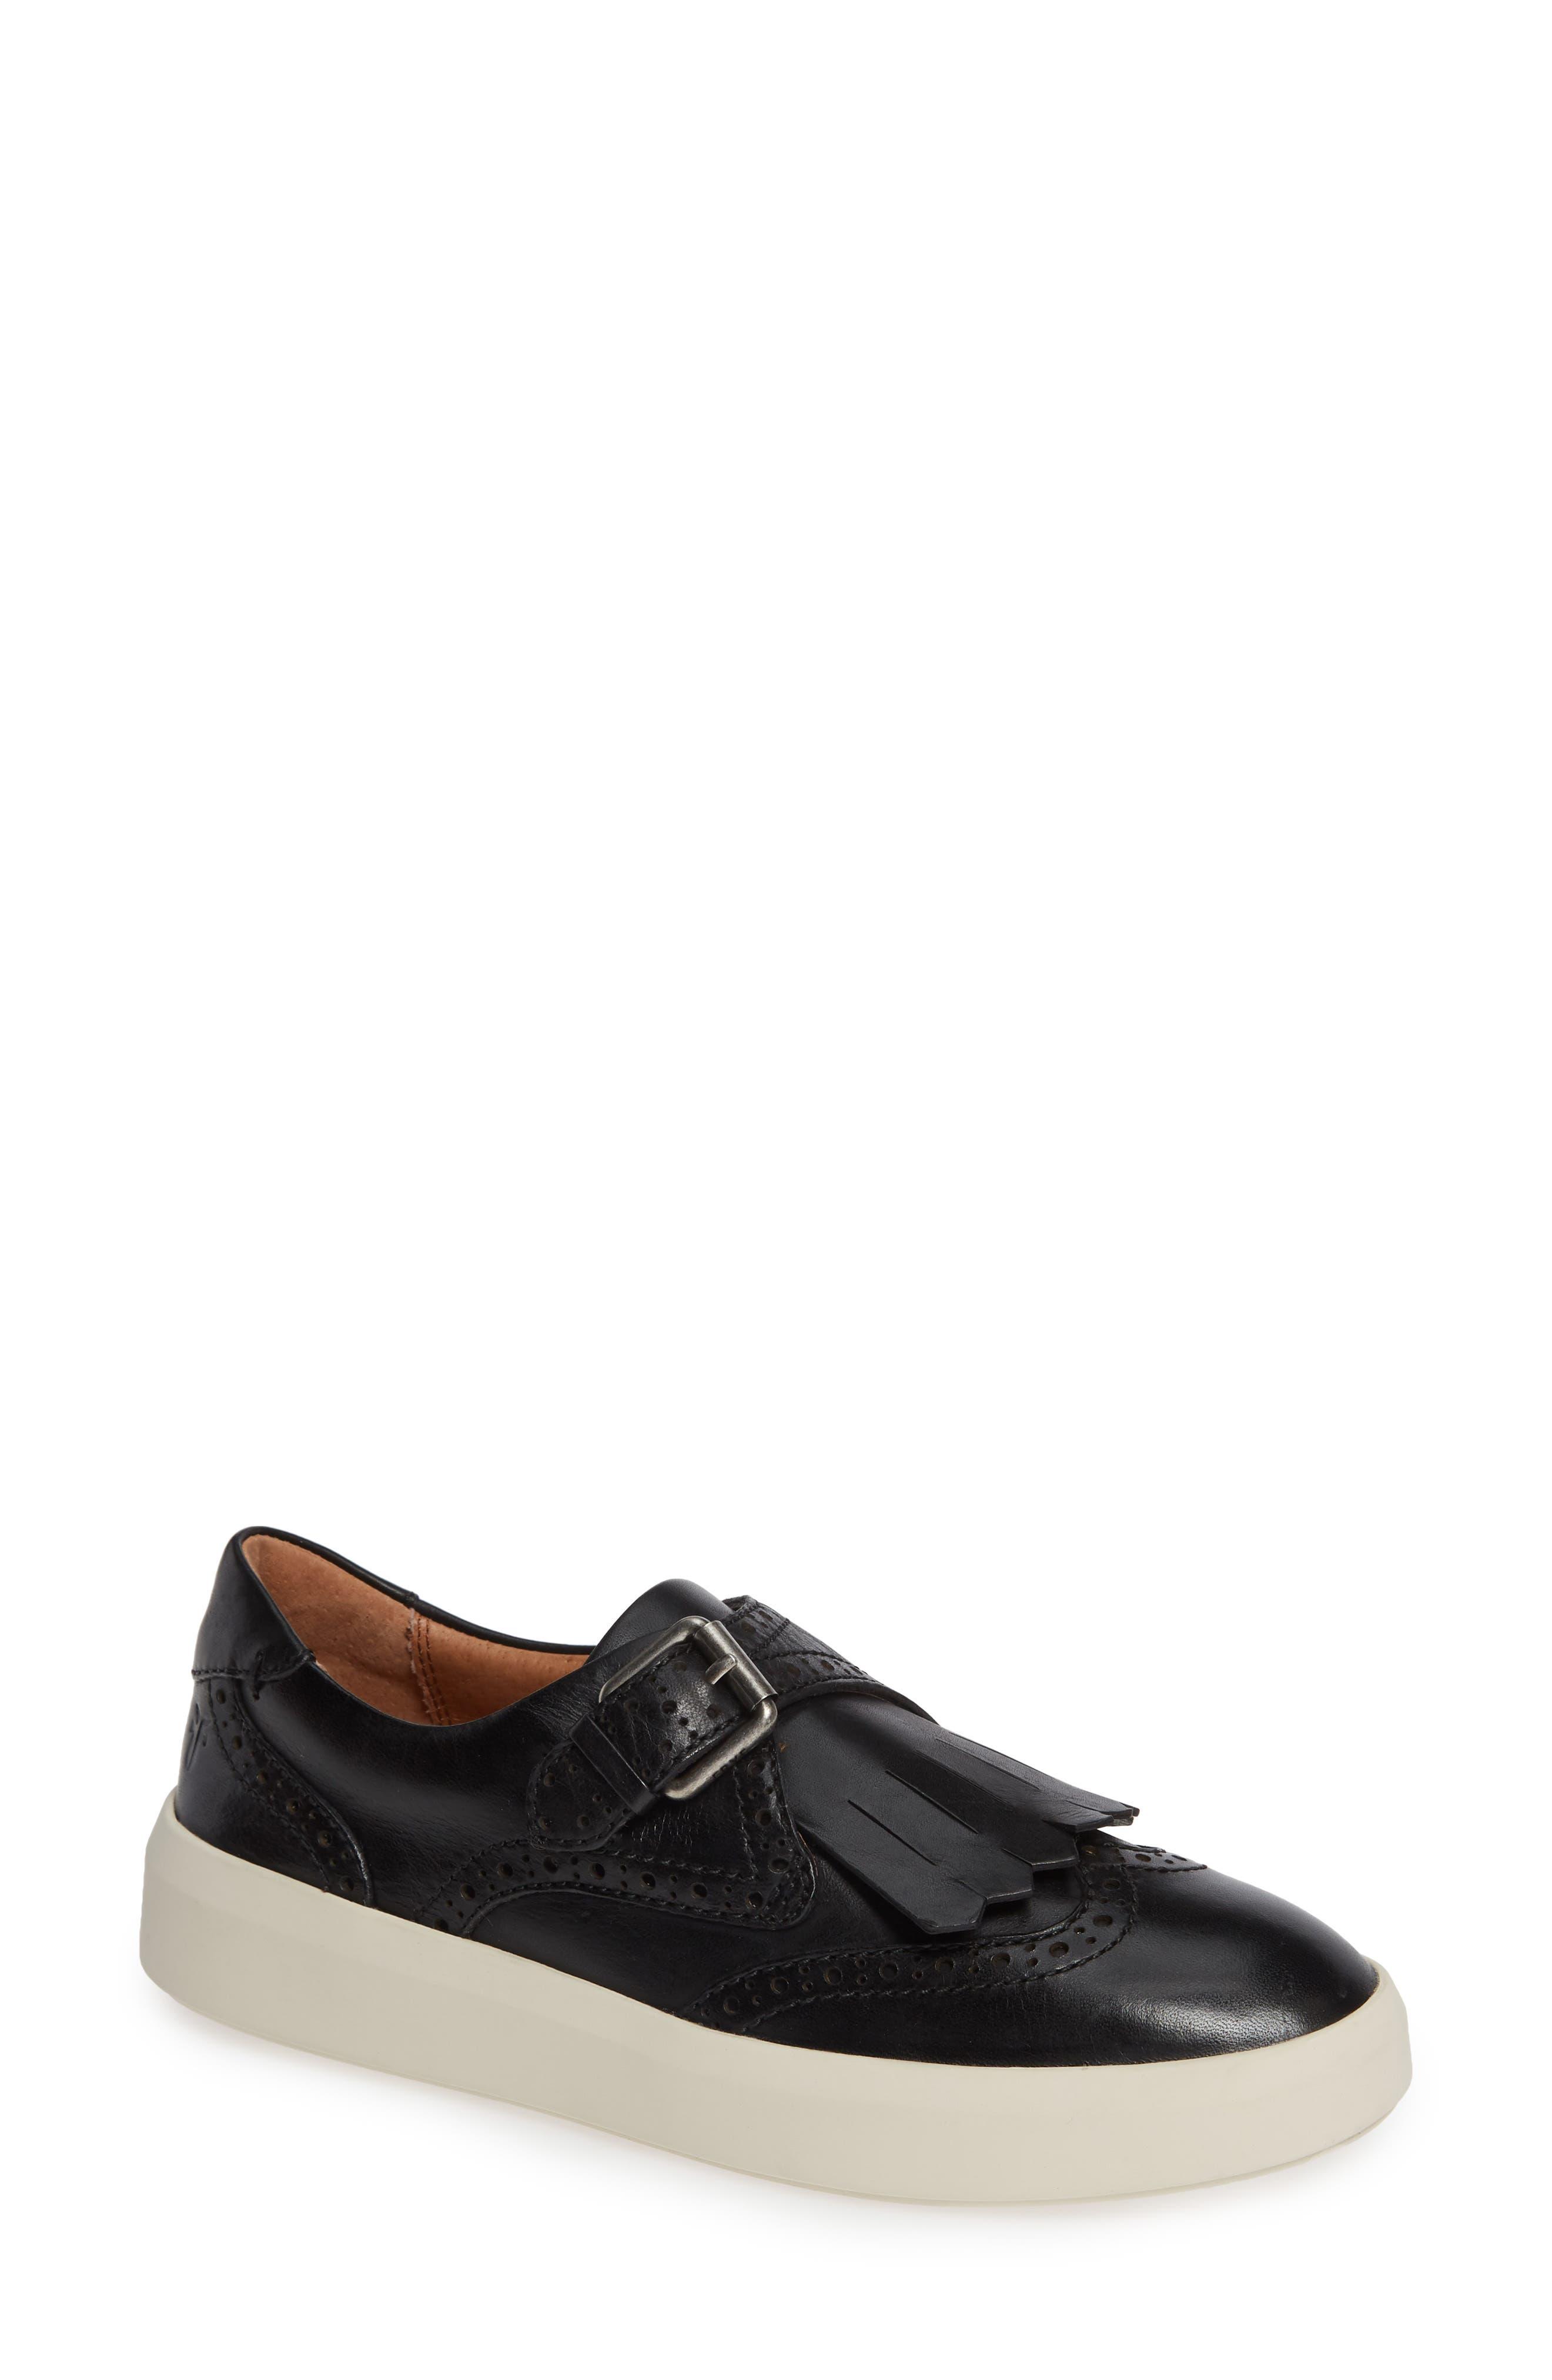 Brea Leather Wing-Tip Kiltie Skate Sneakers in Black Leather